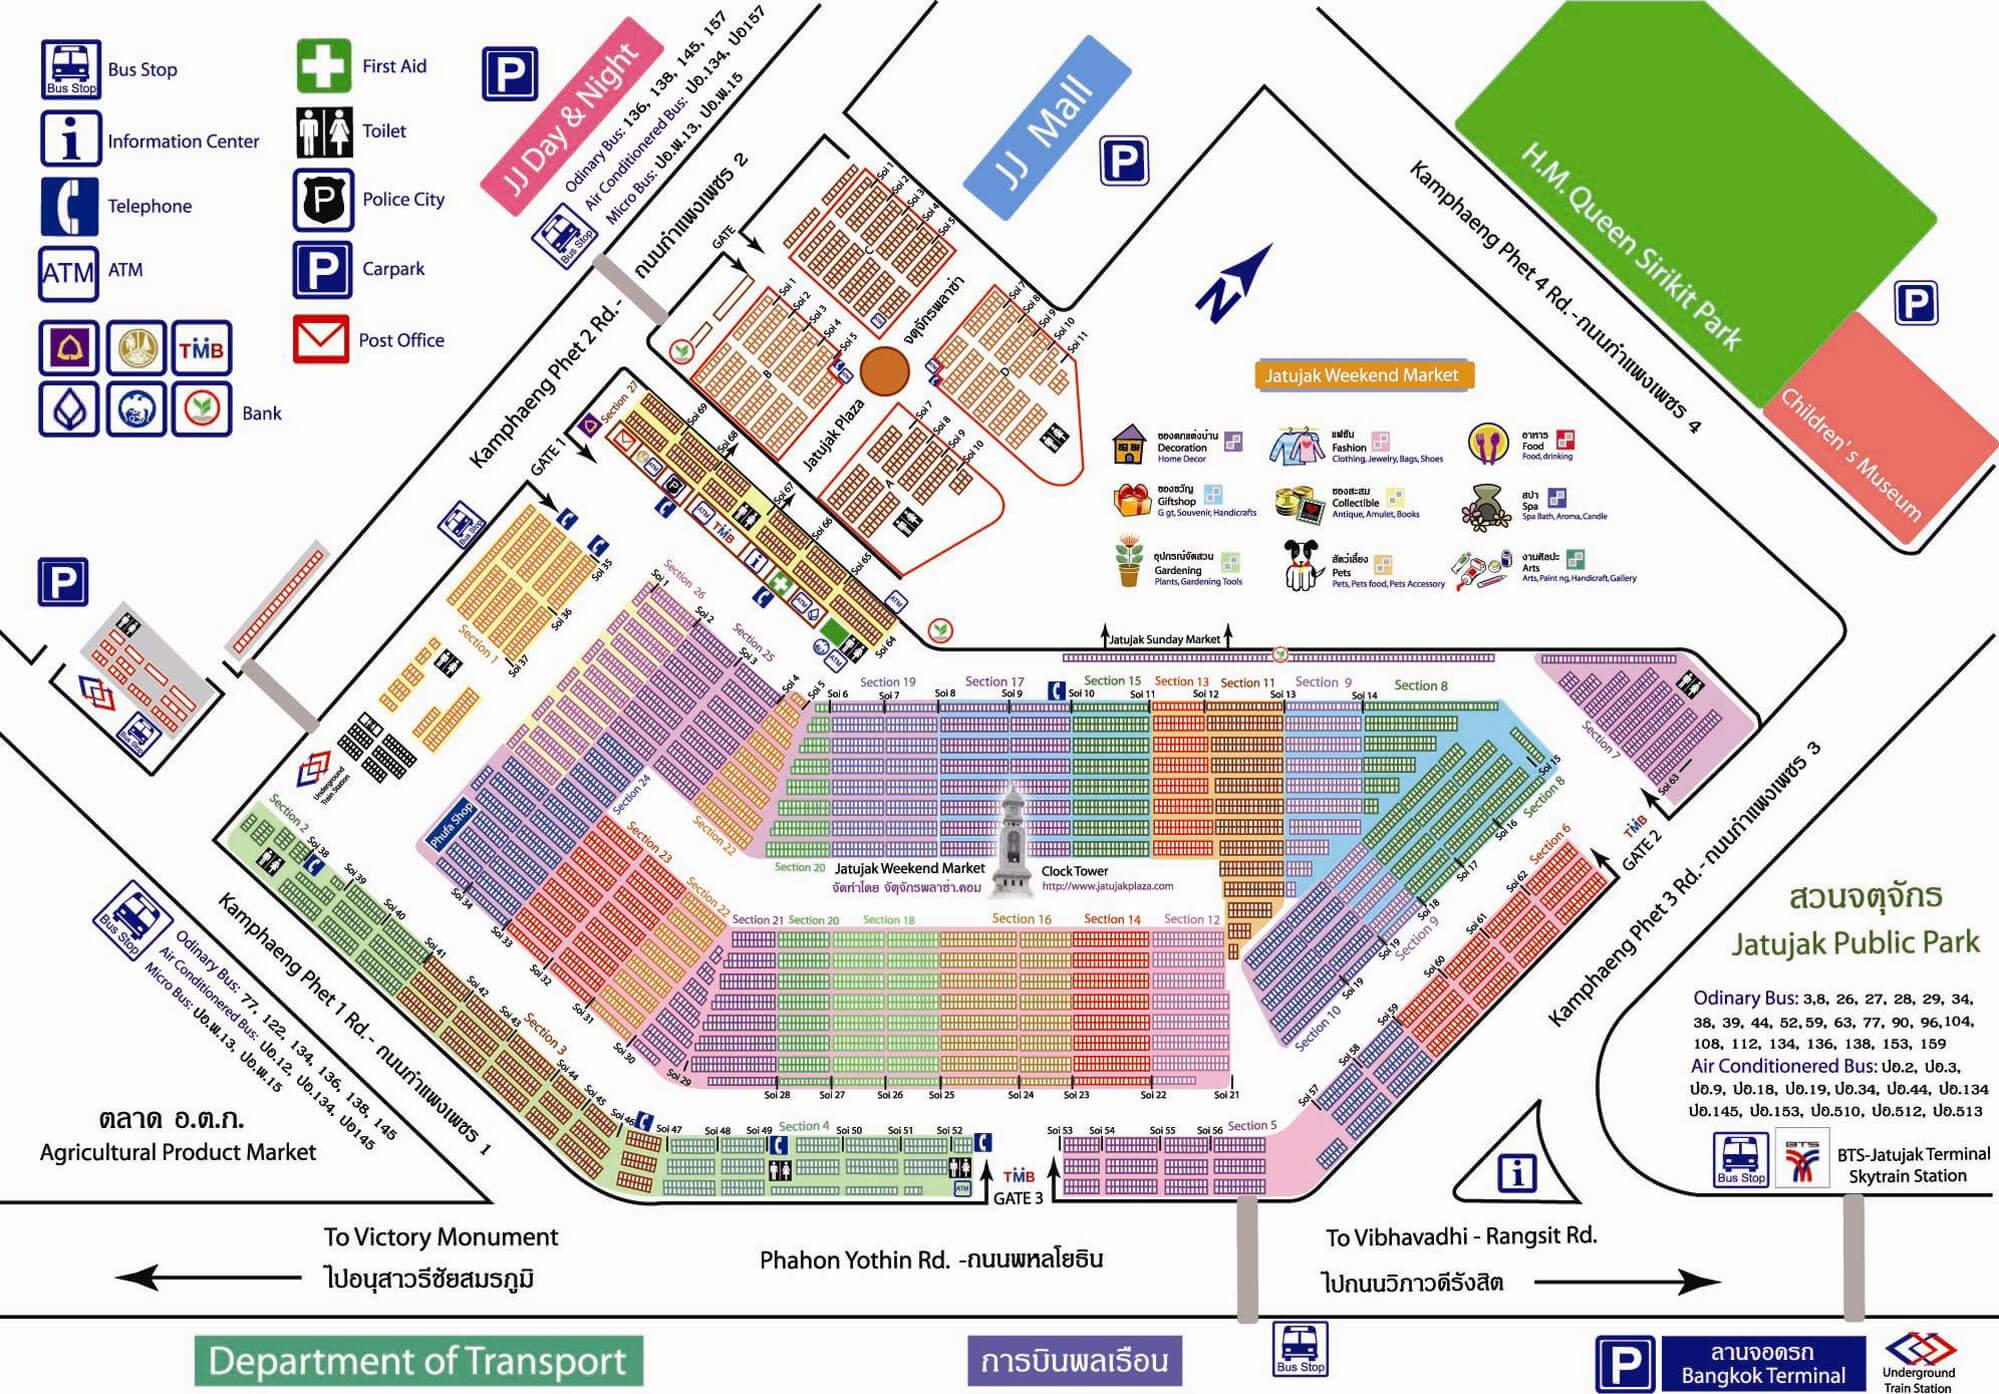 Map of Chatuchak Weekend Market